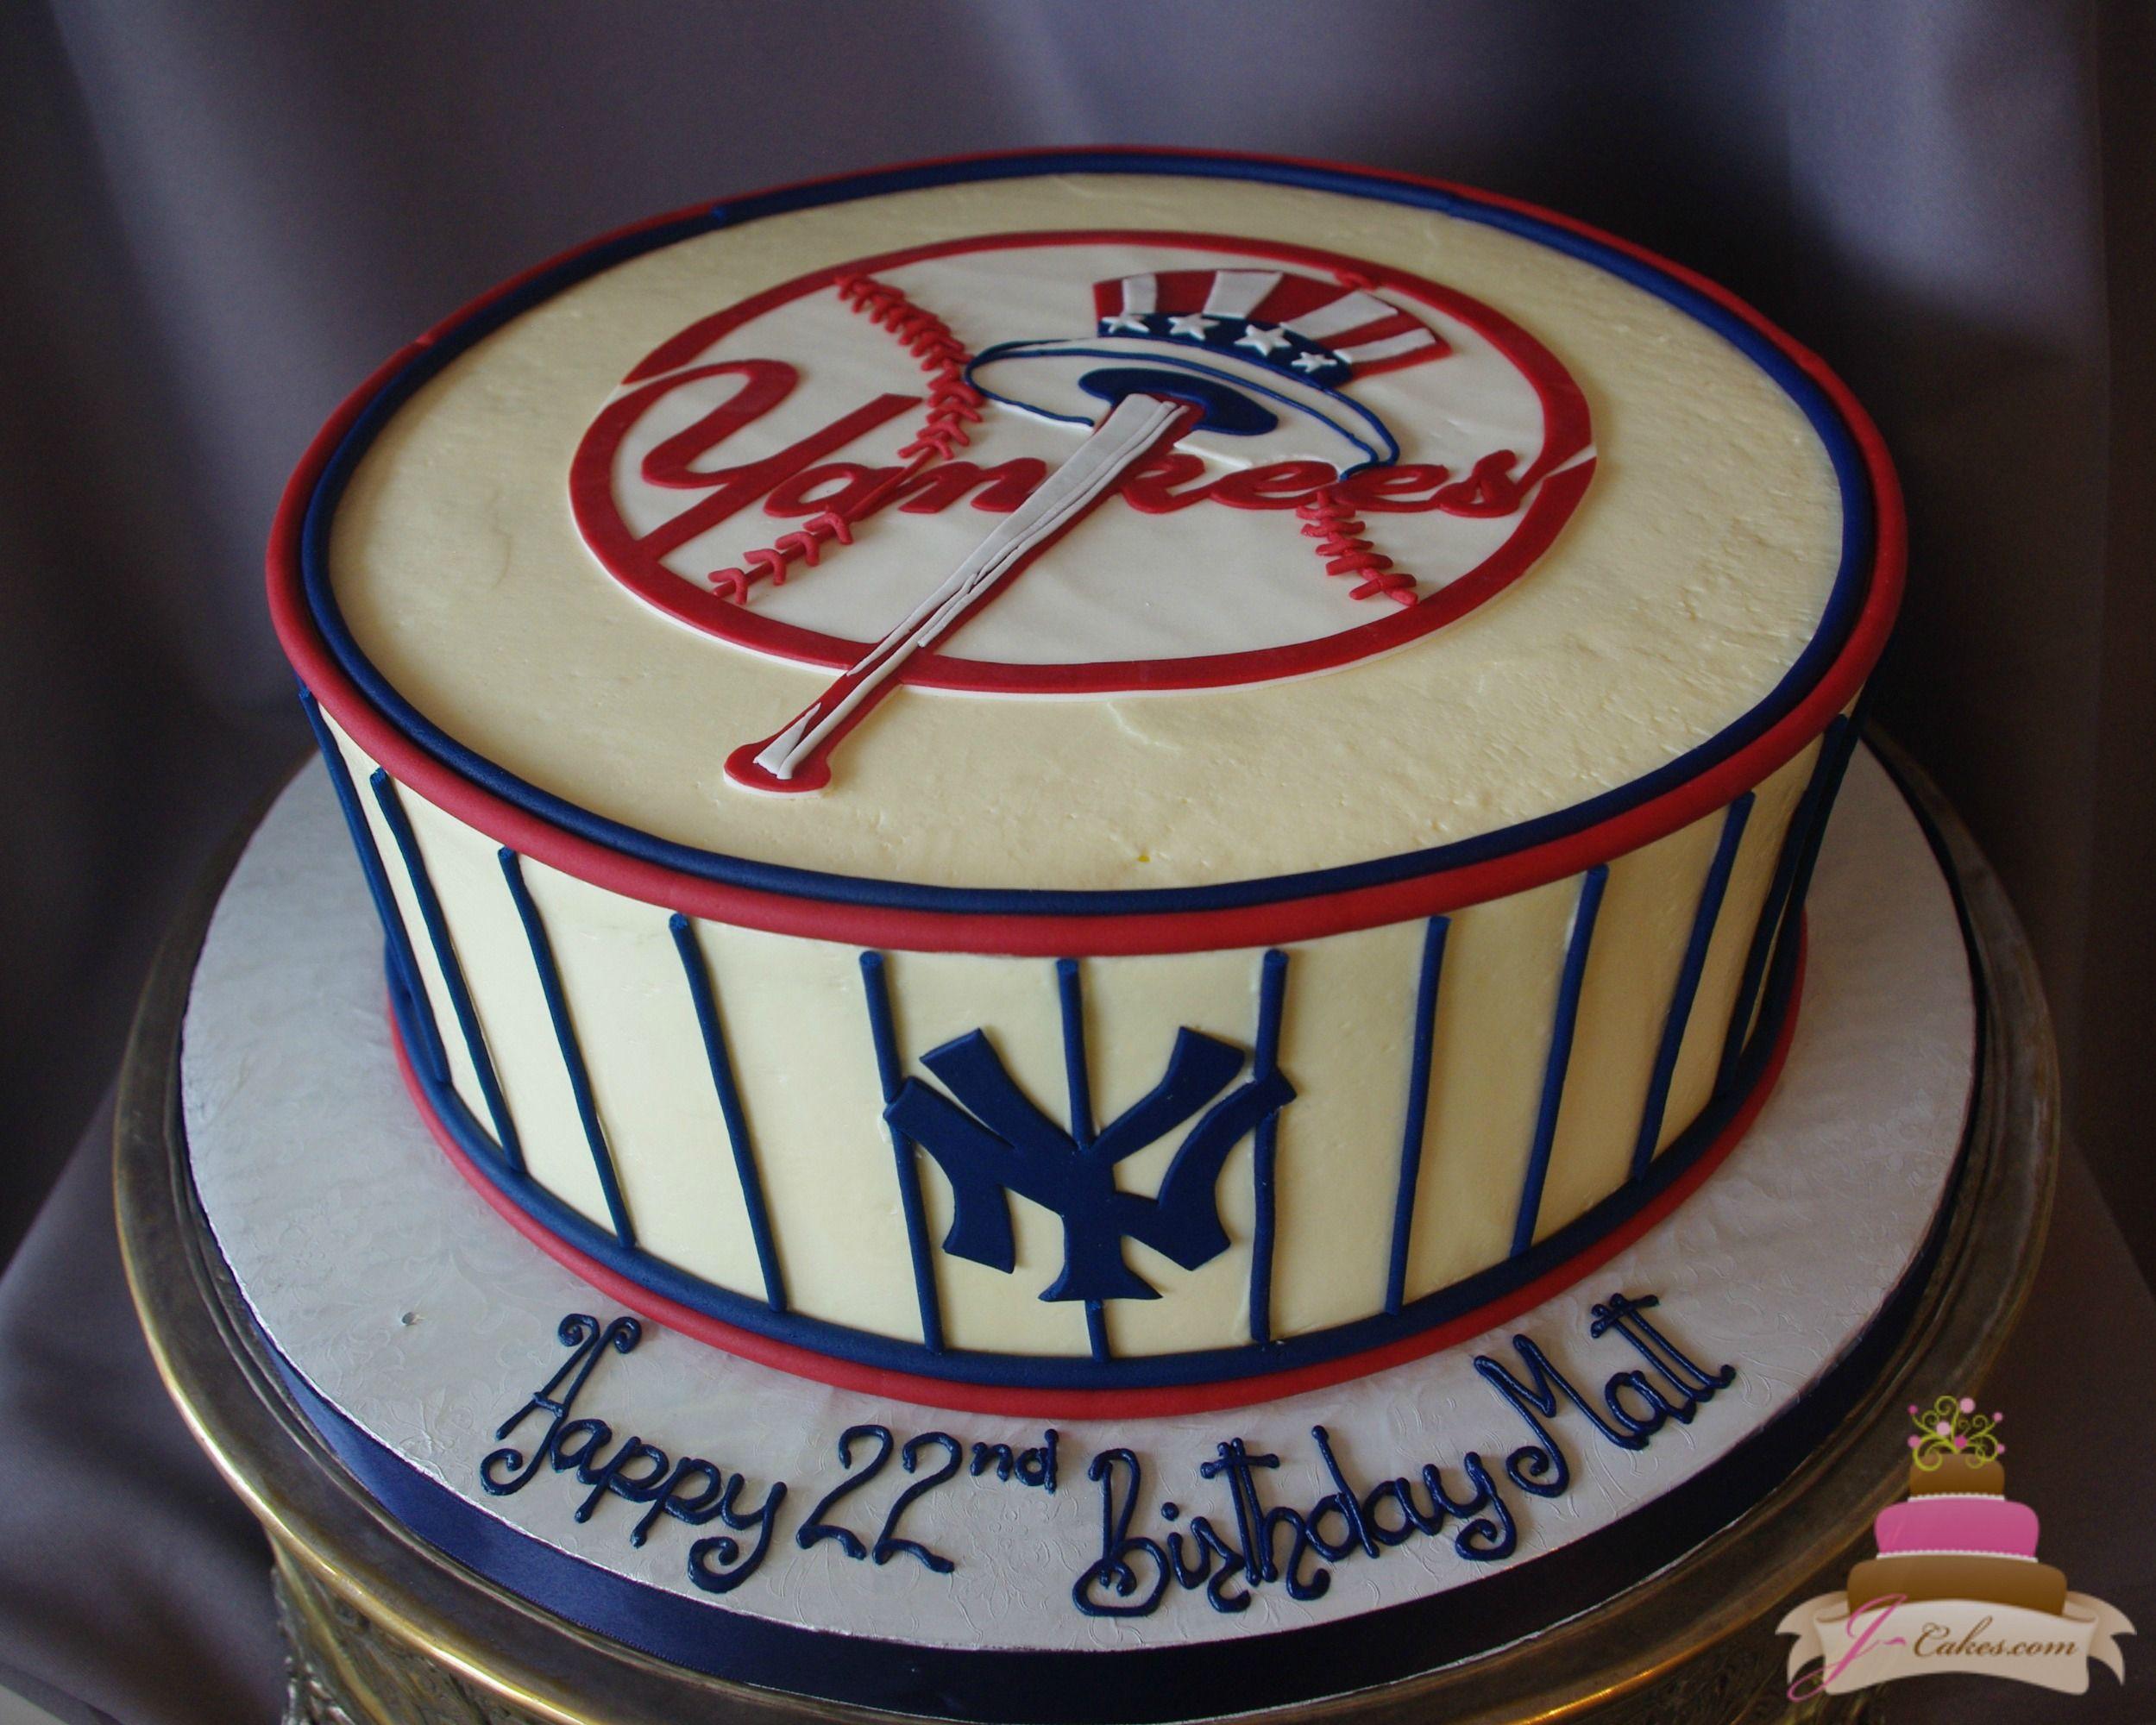 Birthdays Jcakes Yankee Cake Cake 50th Birthday Cake